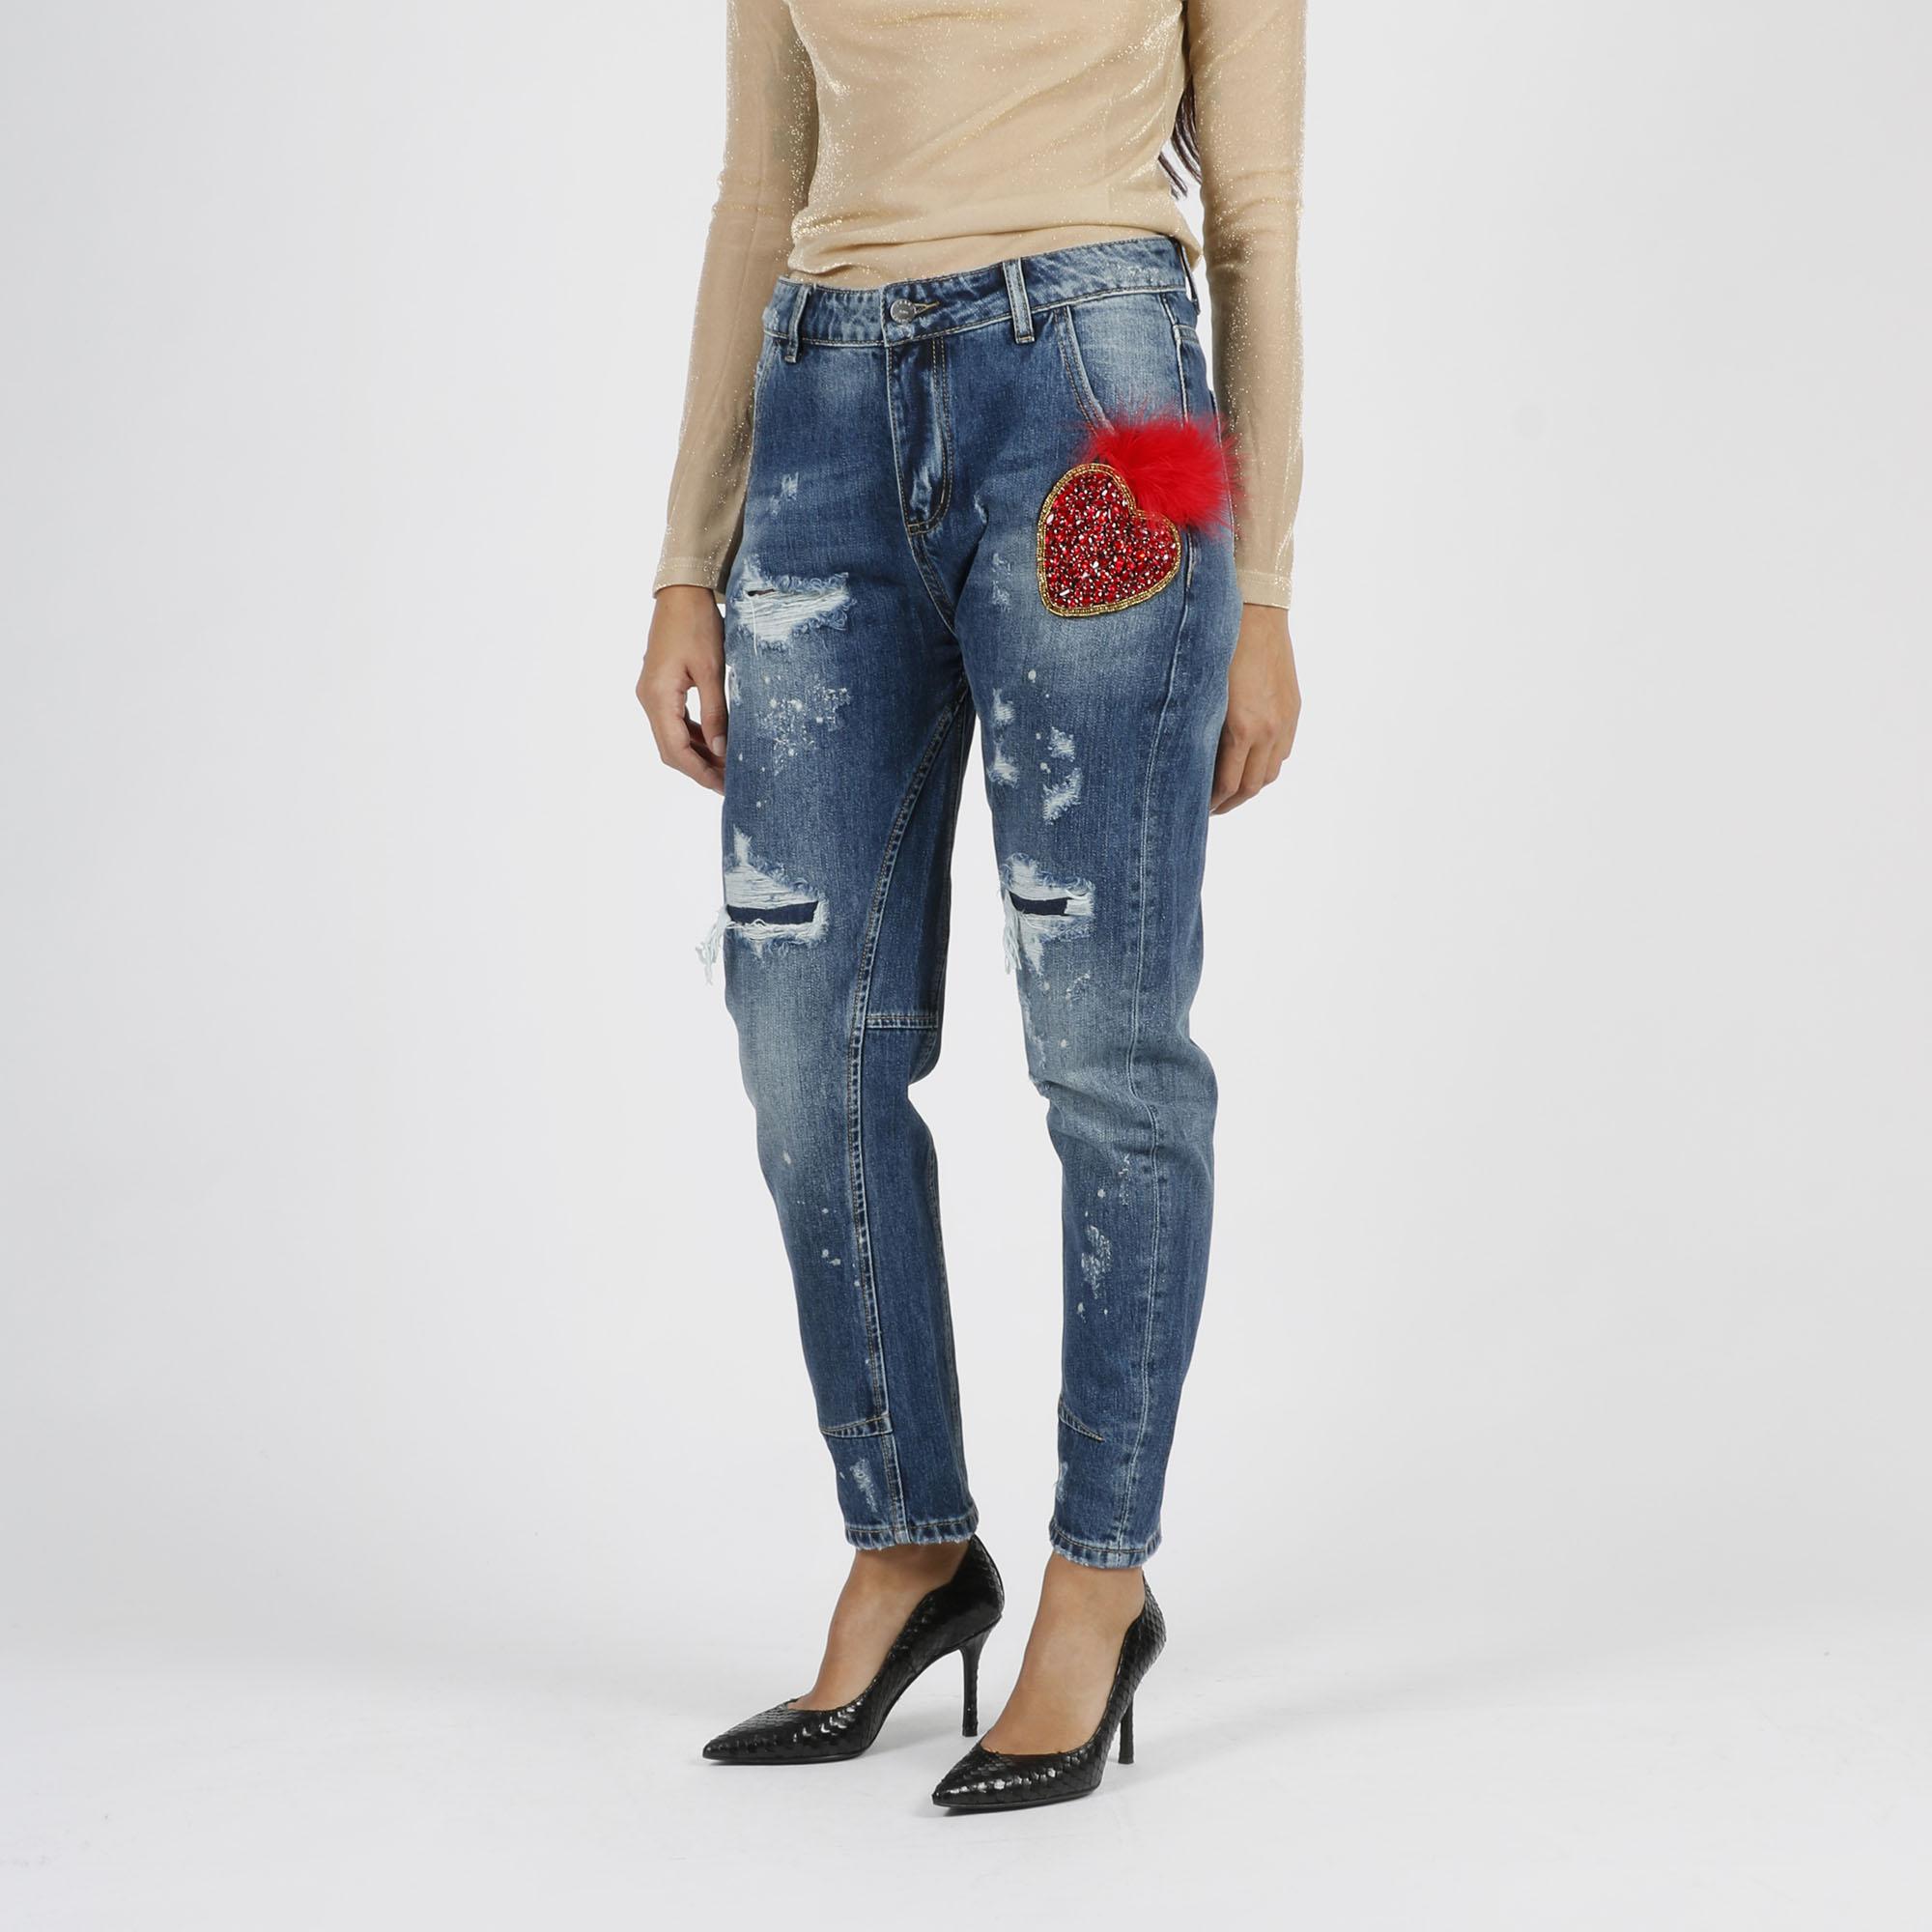 Jeans cuore piuma - Denim